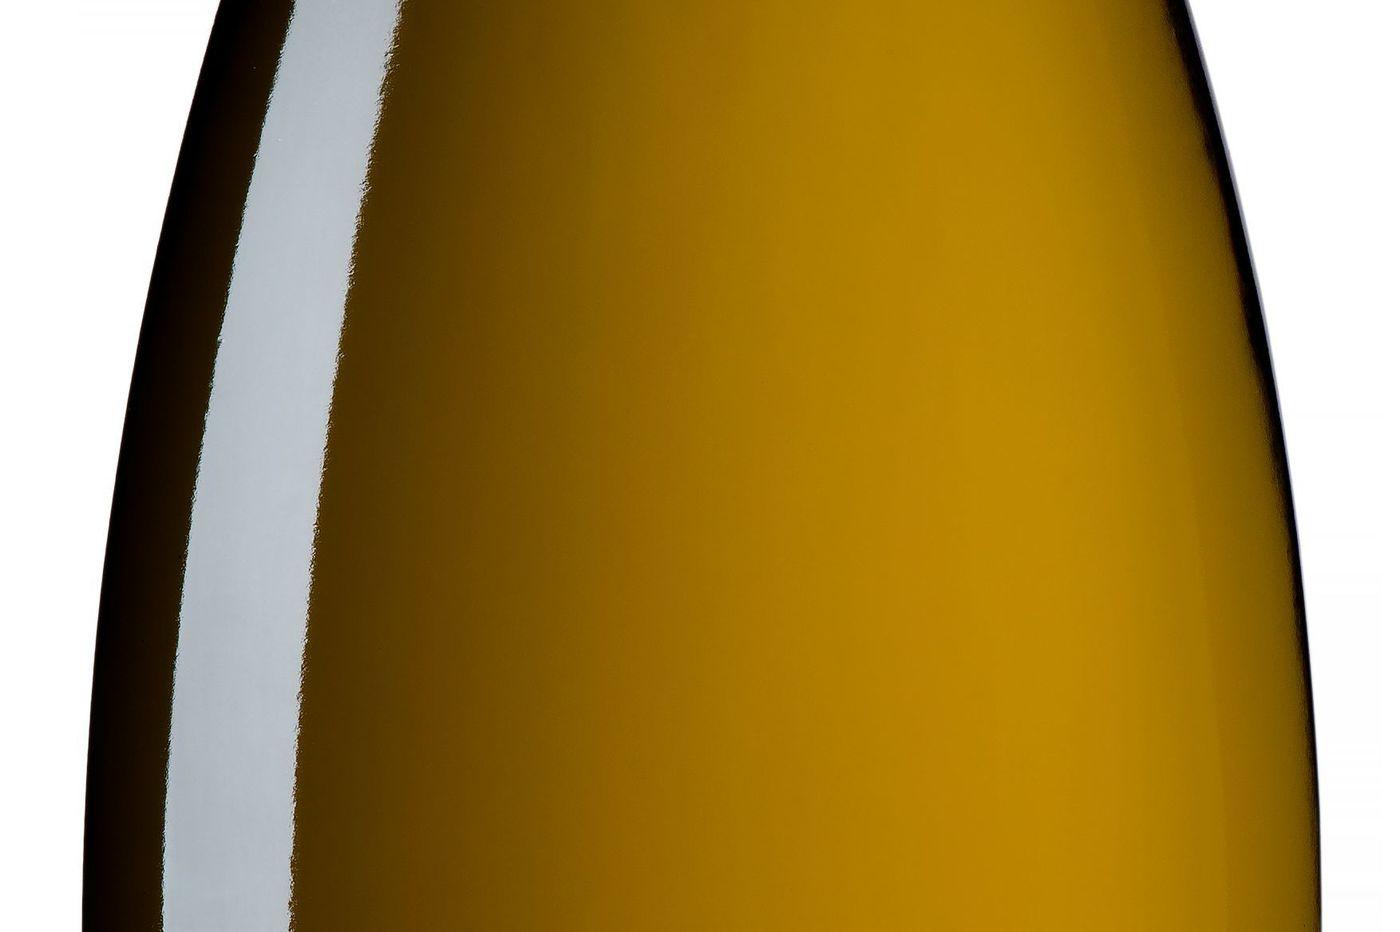 La Crema chardonnay from Sonoma Coast is worth the extra money